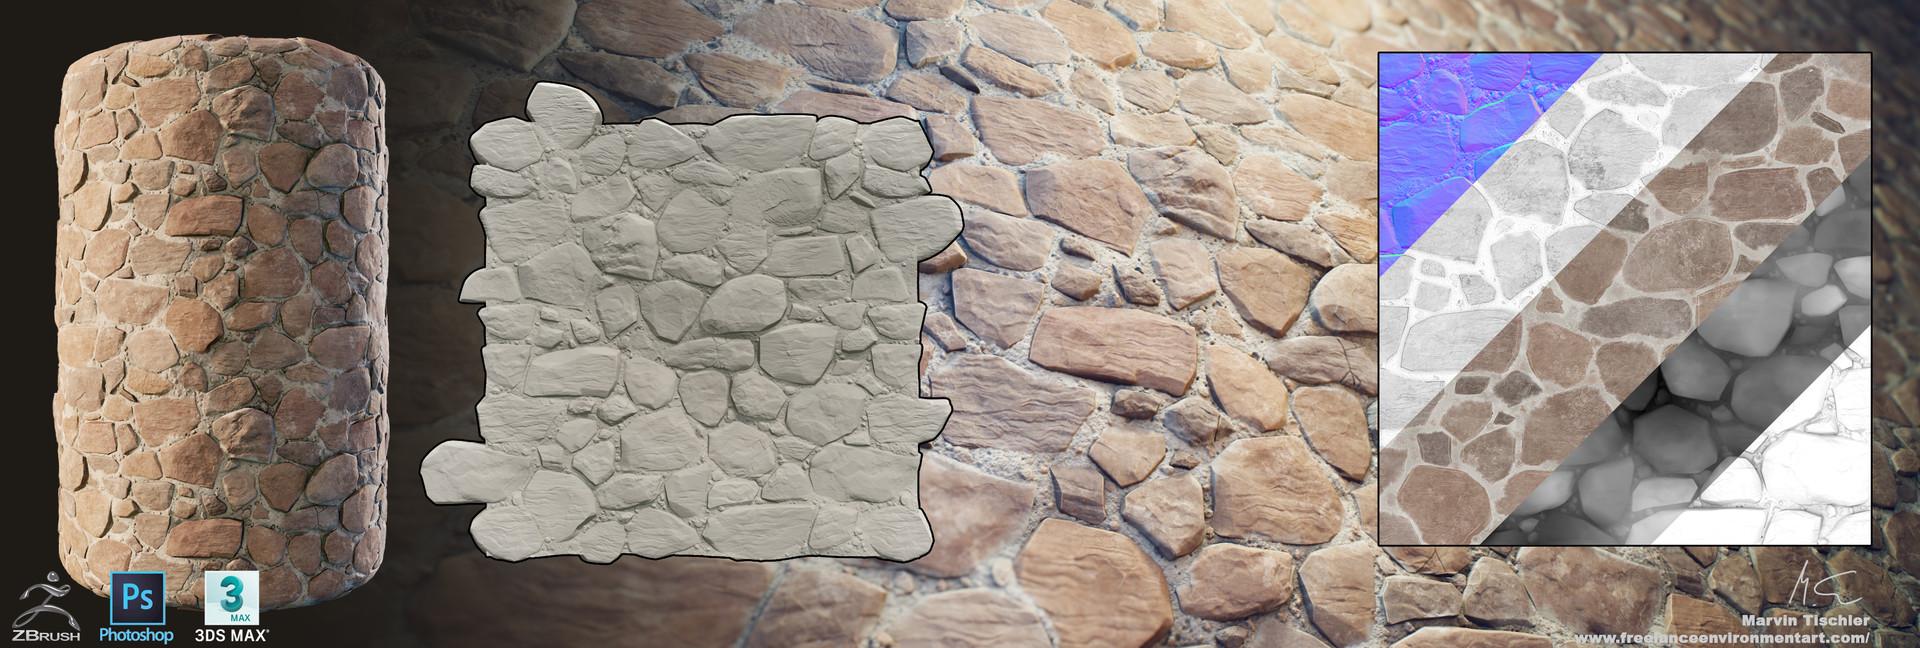 Marvin tischler textures 002 n